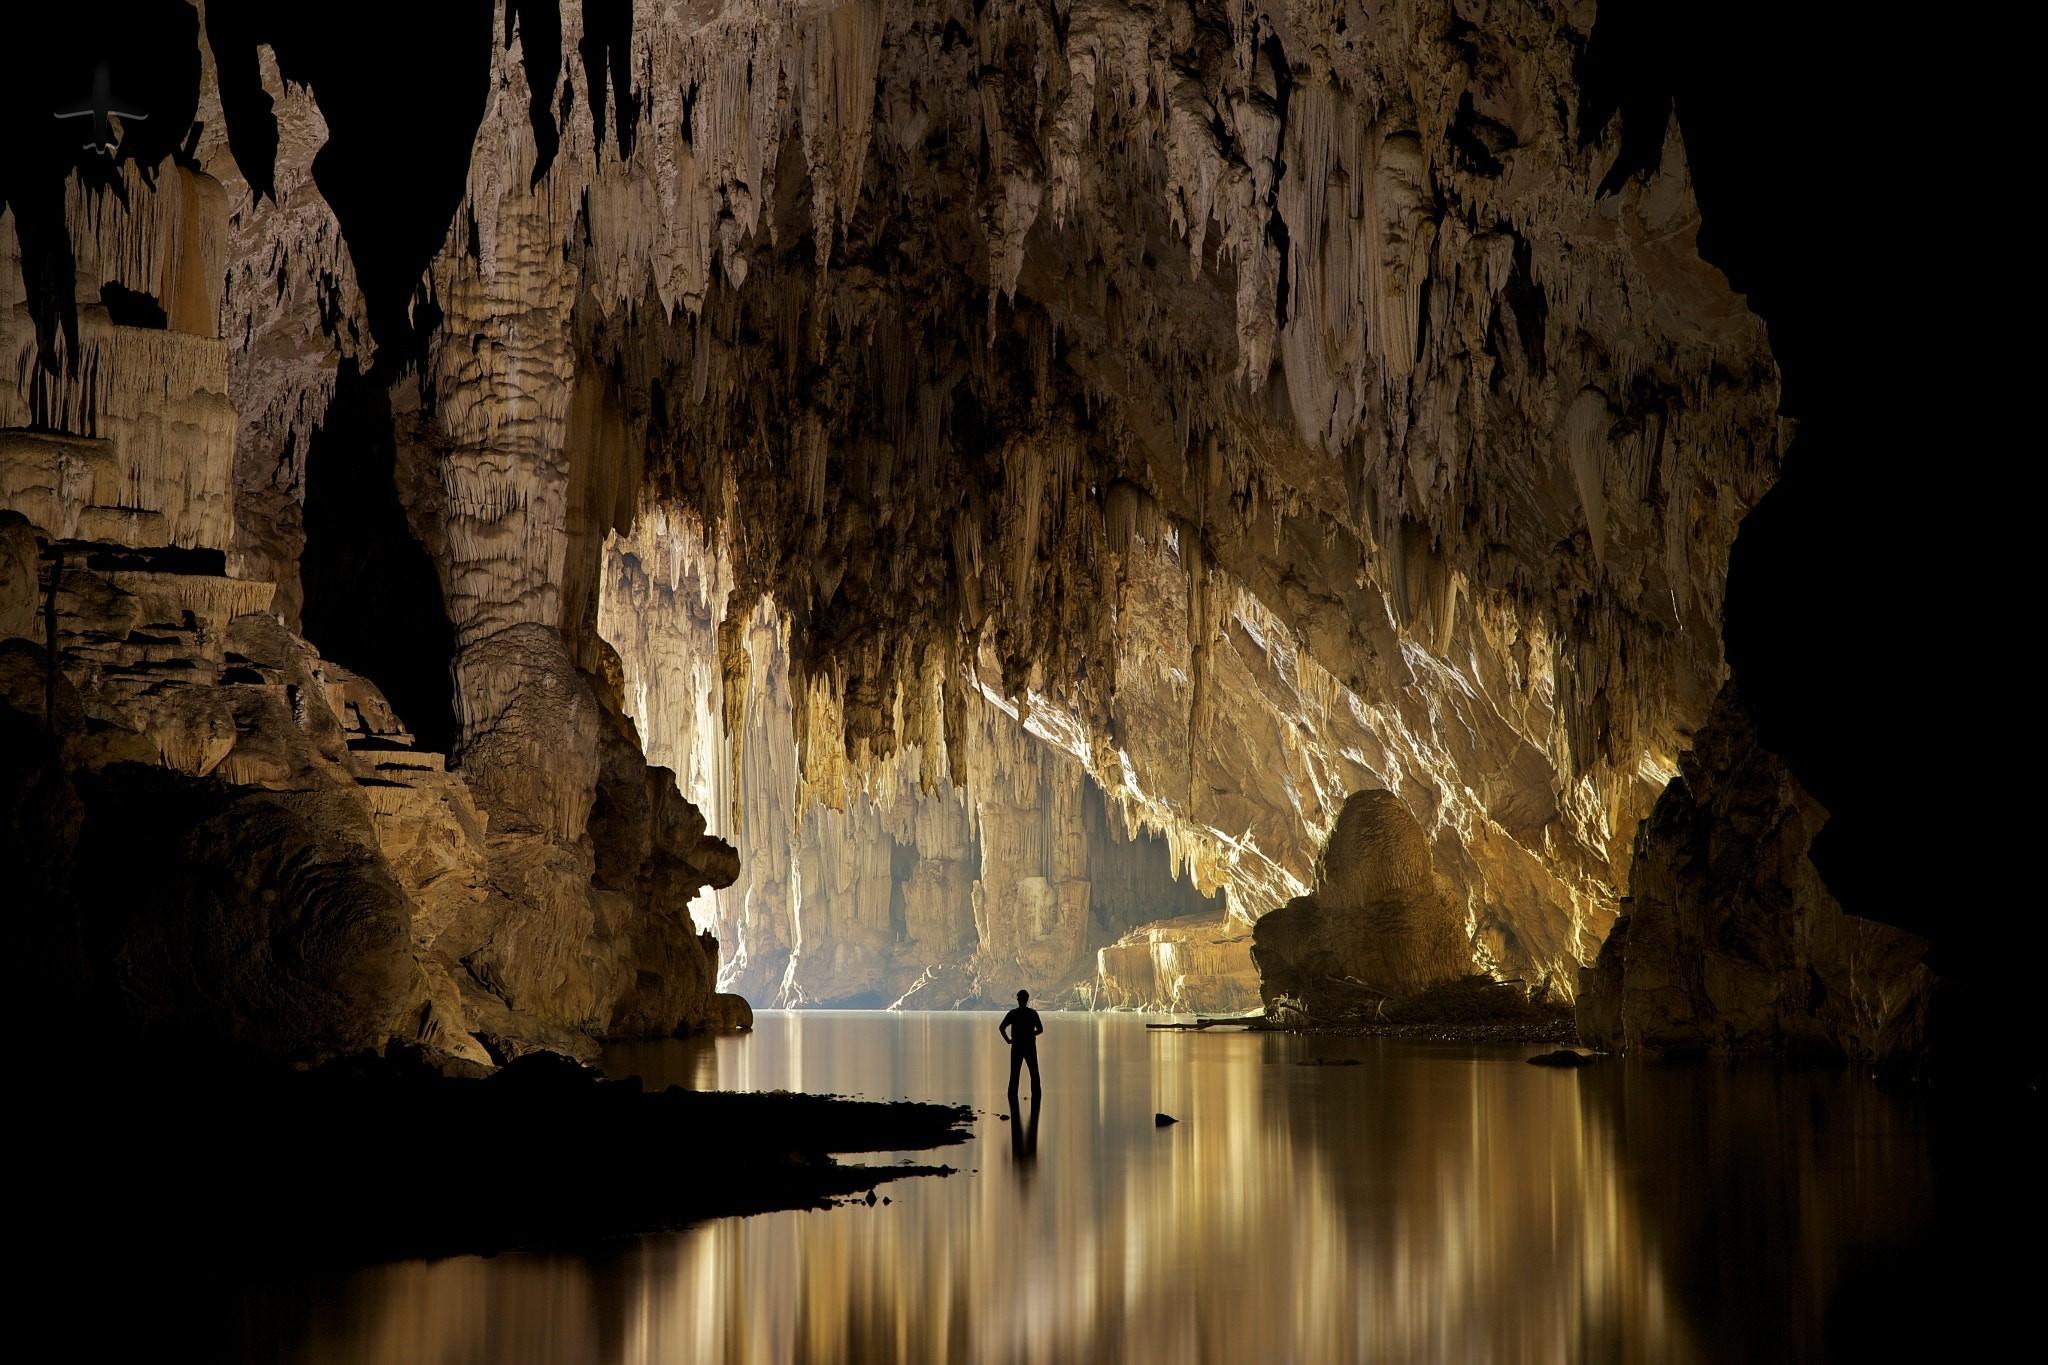 Tainstvennyie peshheryi Tailanda - Таинственные пещеры Таиланда